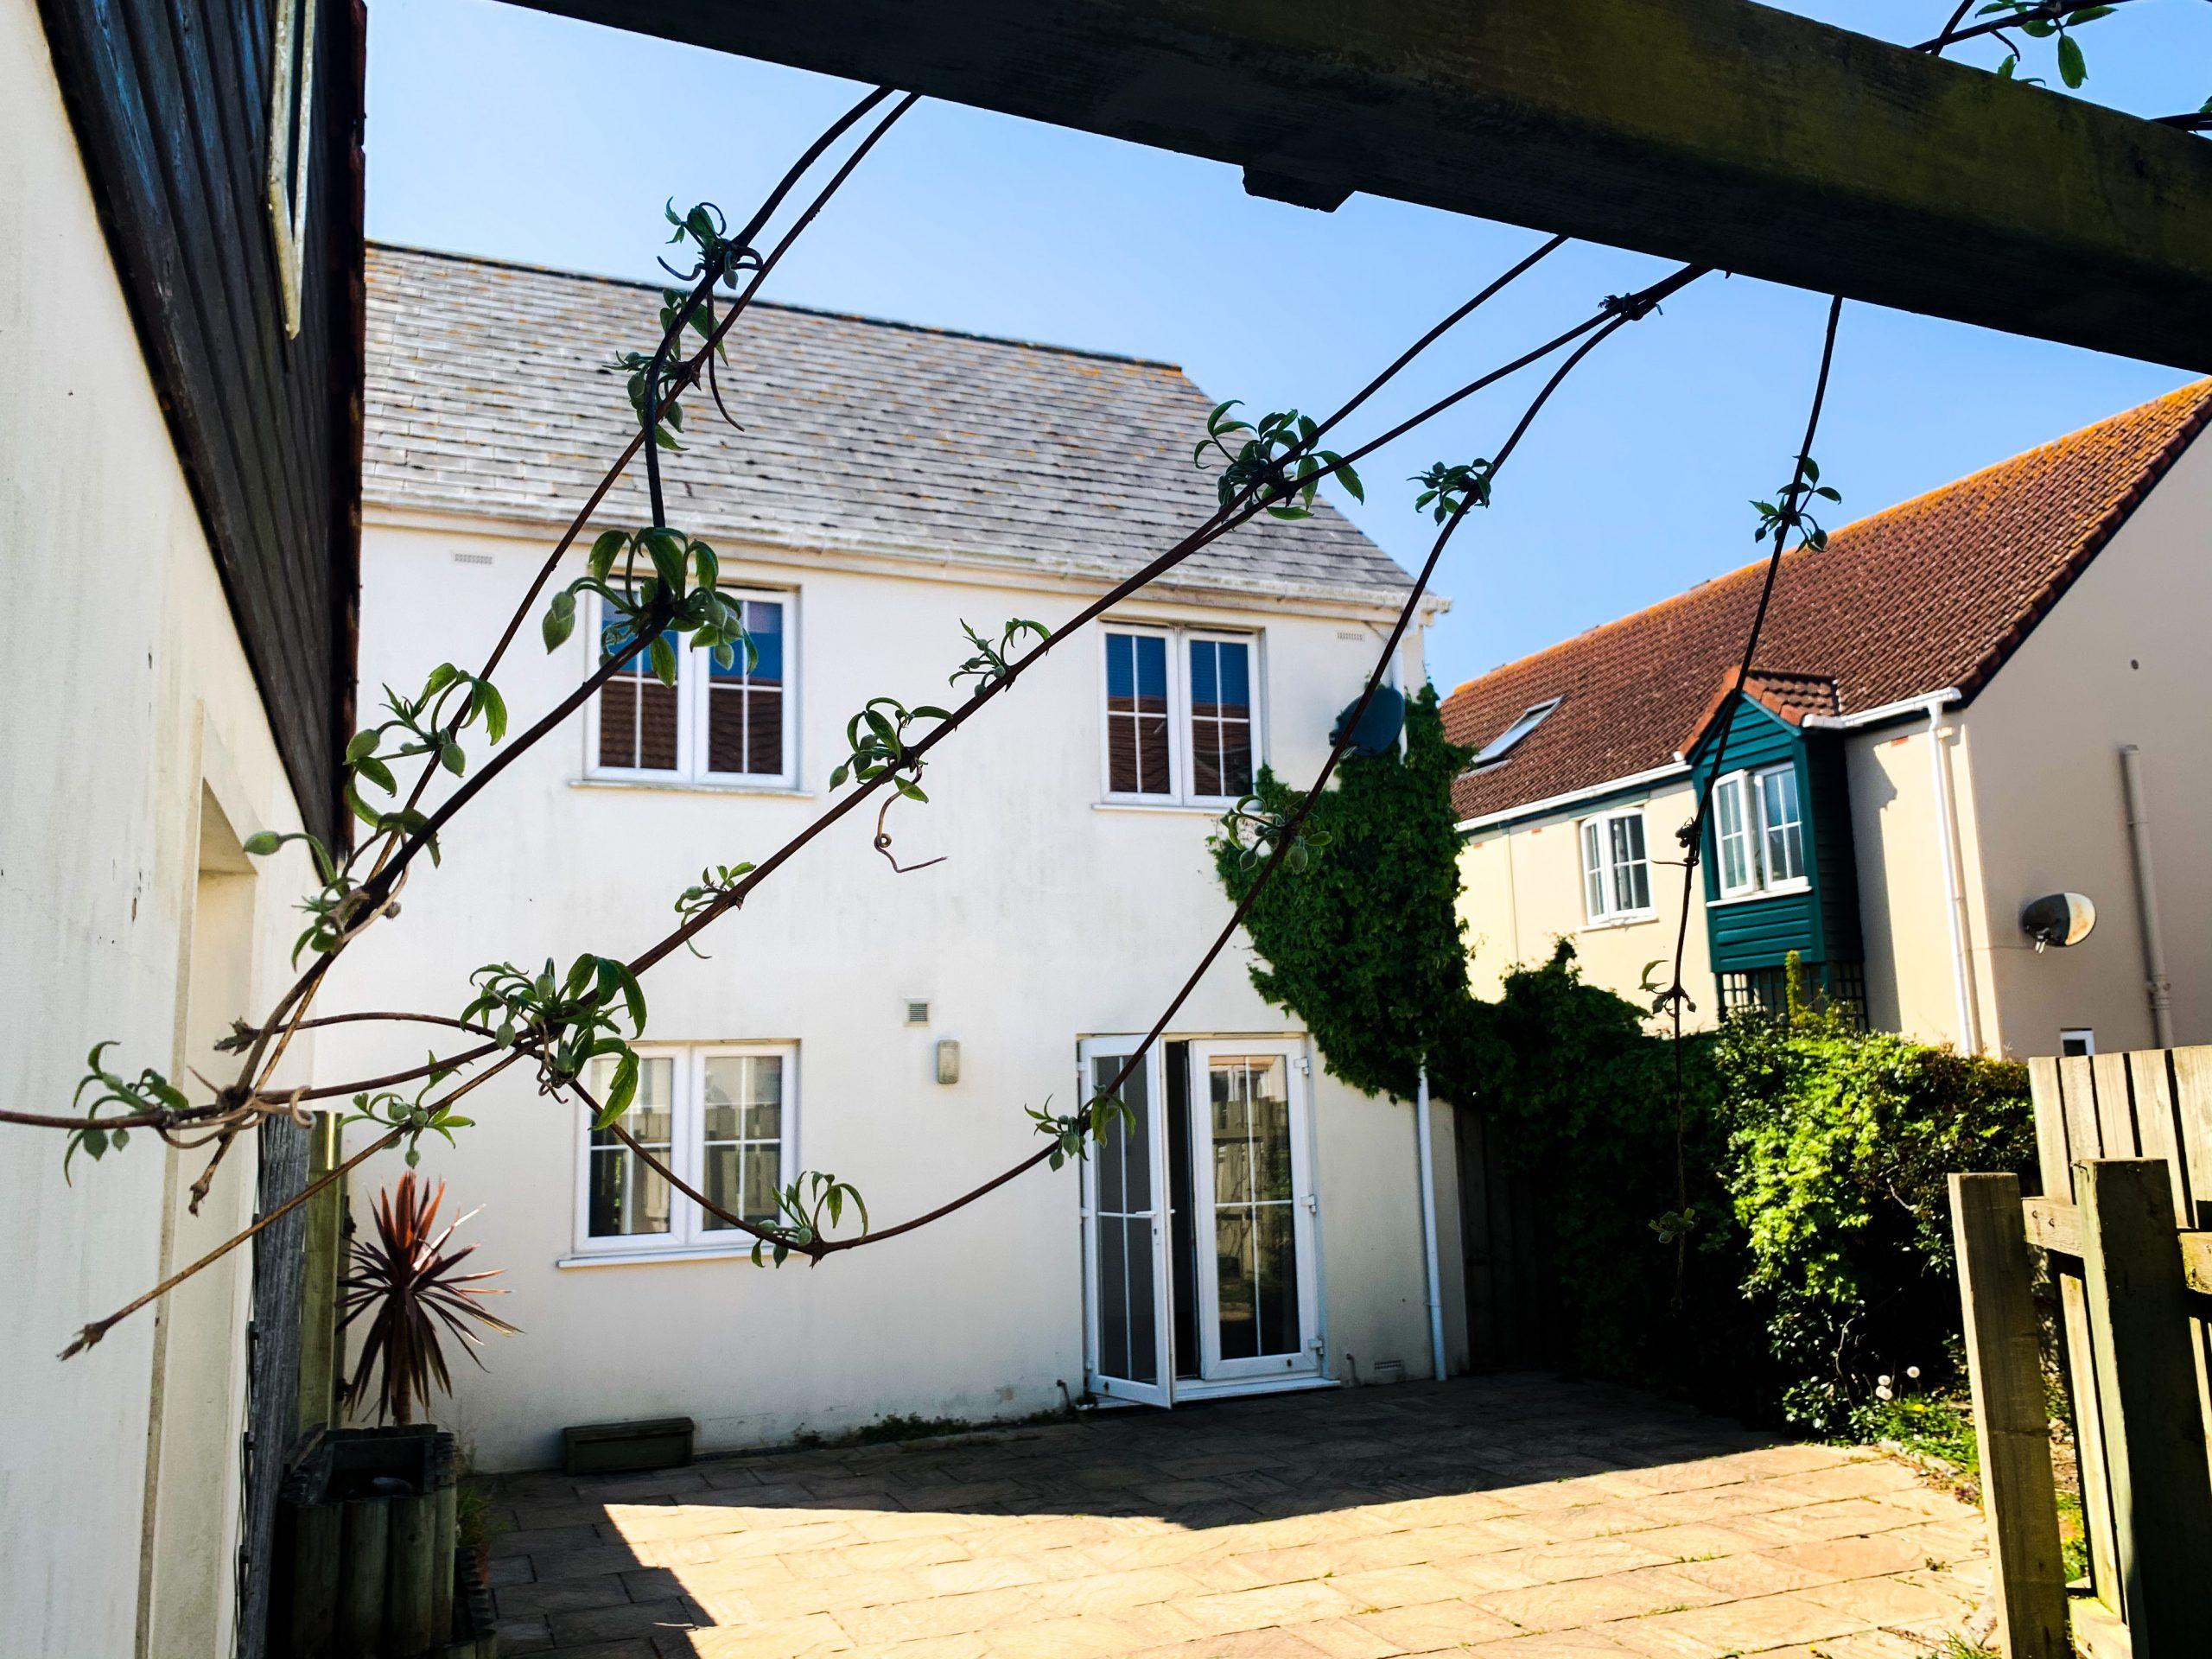 Ideal Detached 3 Bedroom Family Home in the West! Garage, Parking & Garden